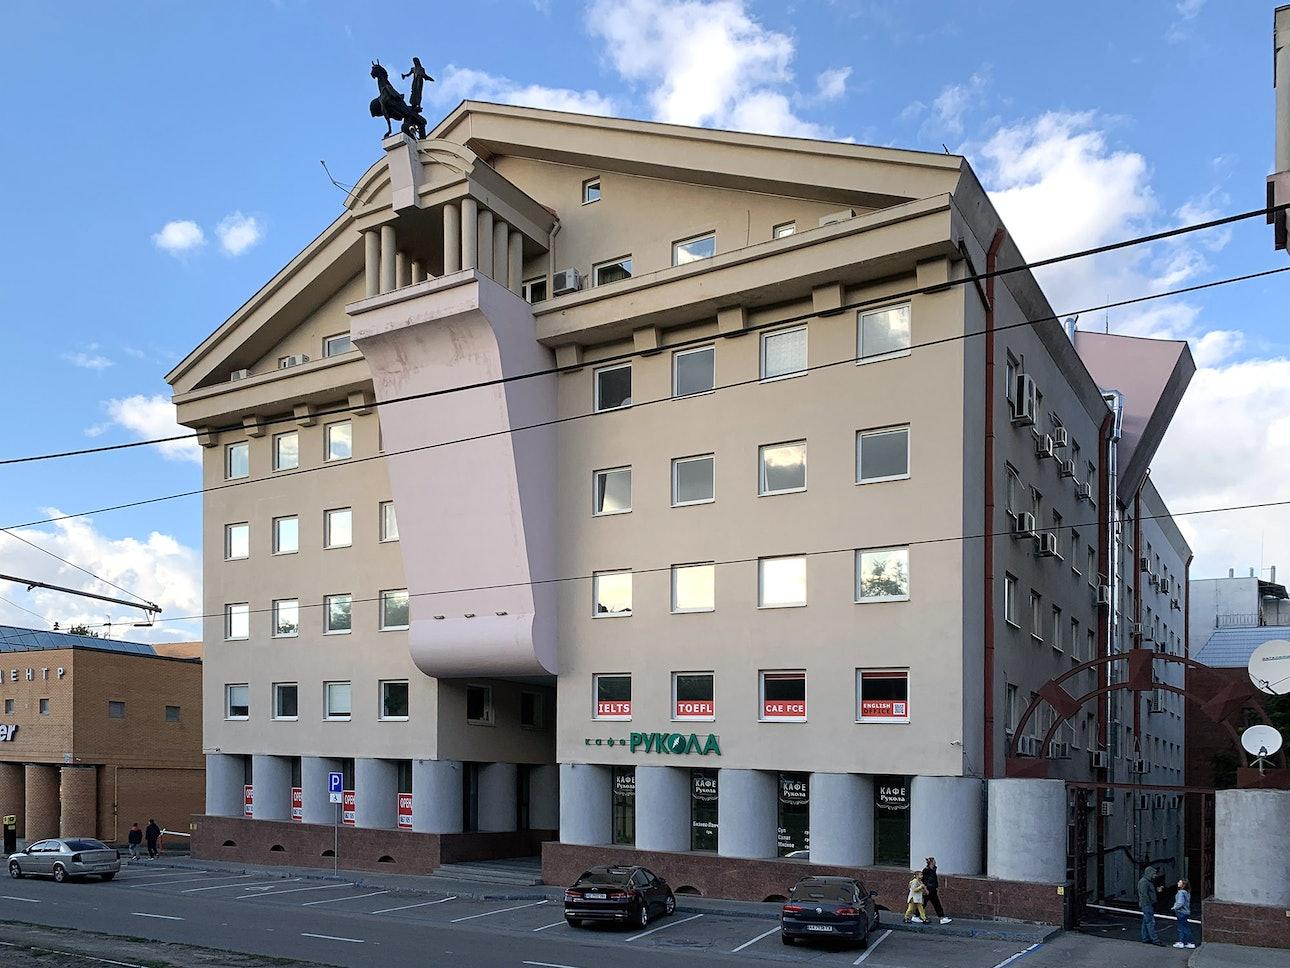 Офис компании Rainford в Днепре архитектура постмодернизм